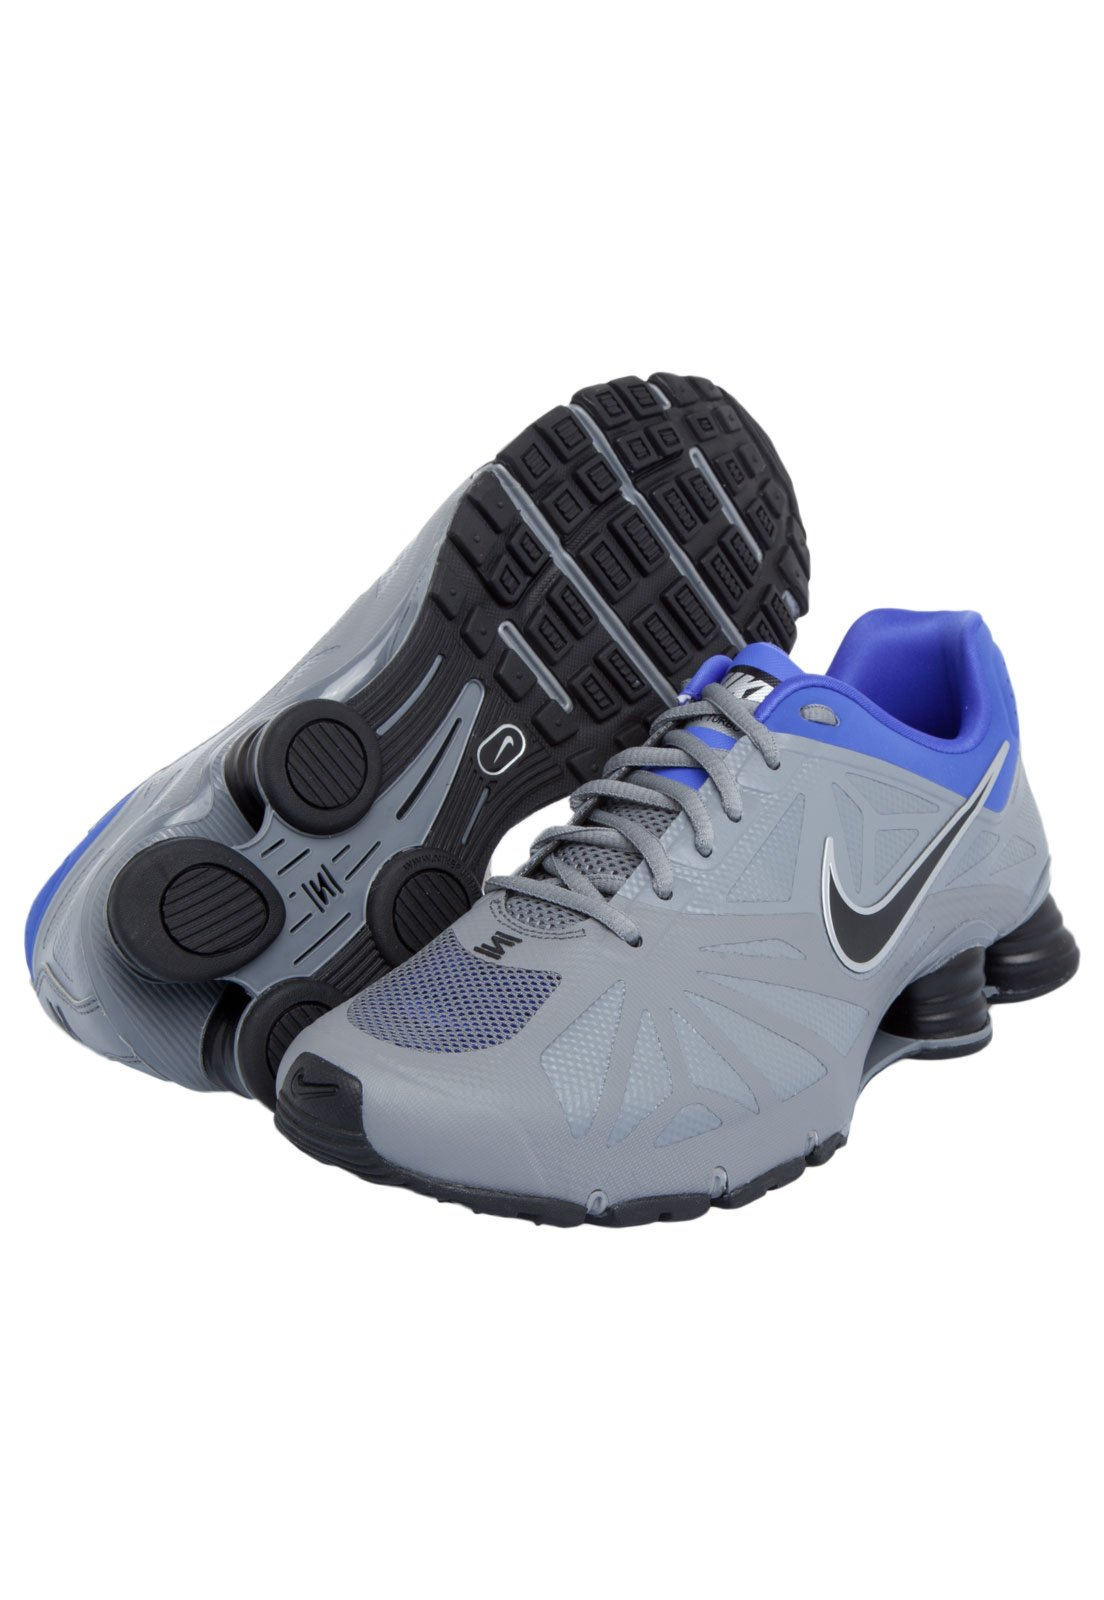 Nike Shox Turbo 2016